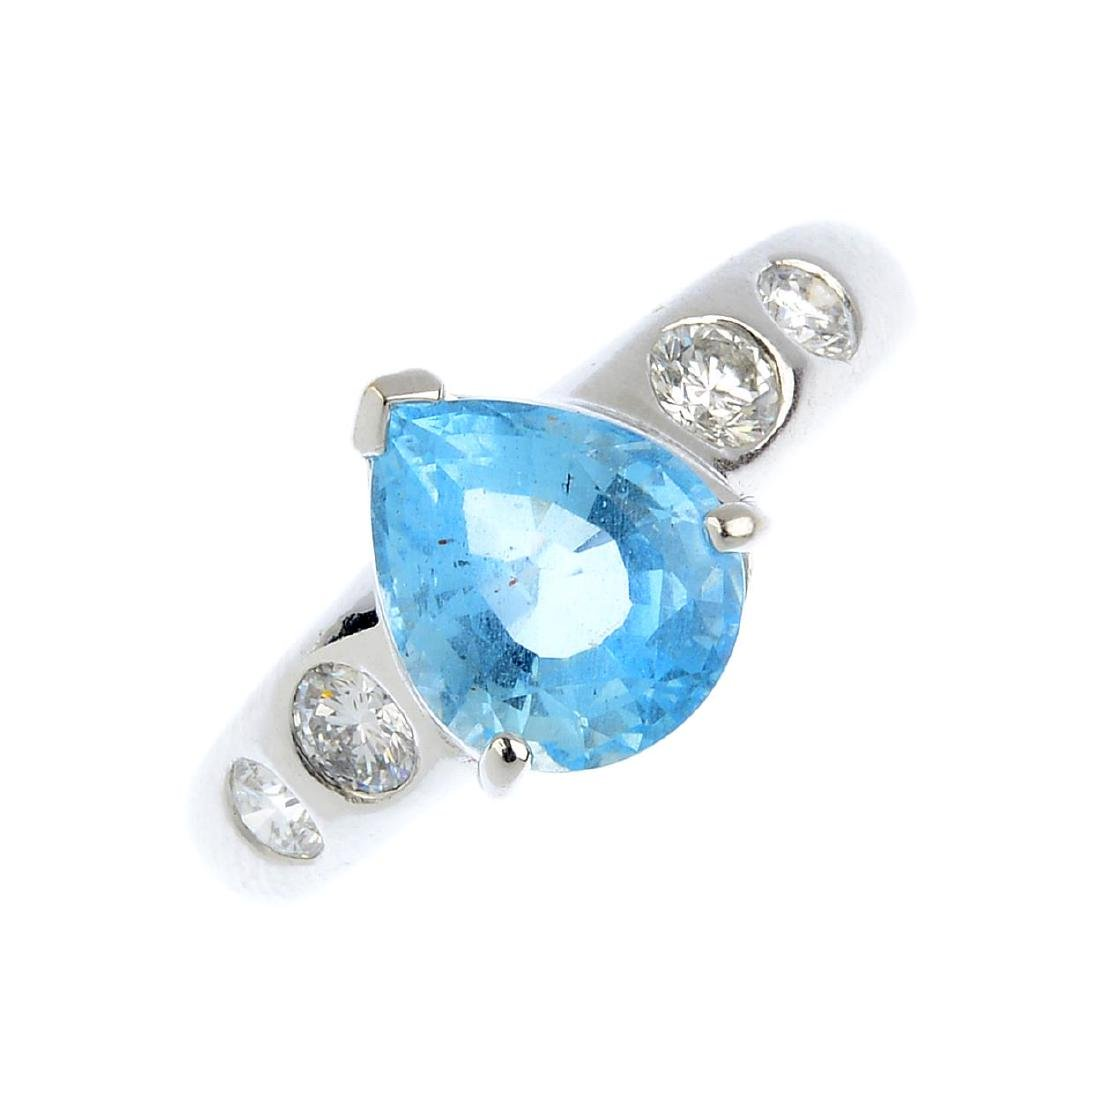 An aquamarine and diamond single-stone ring. The